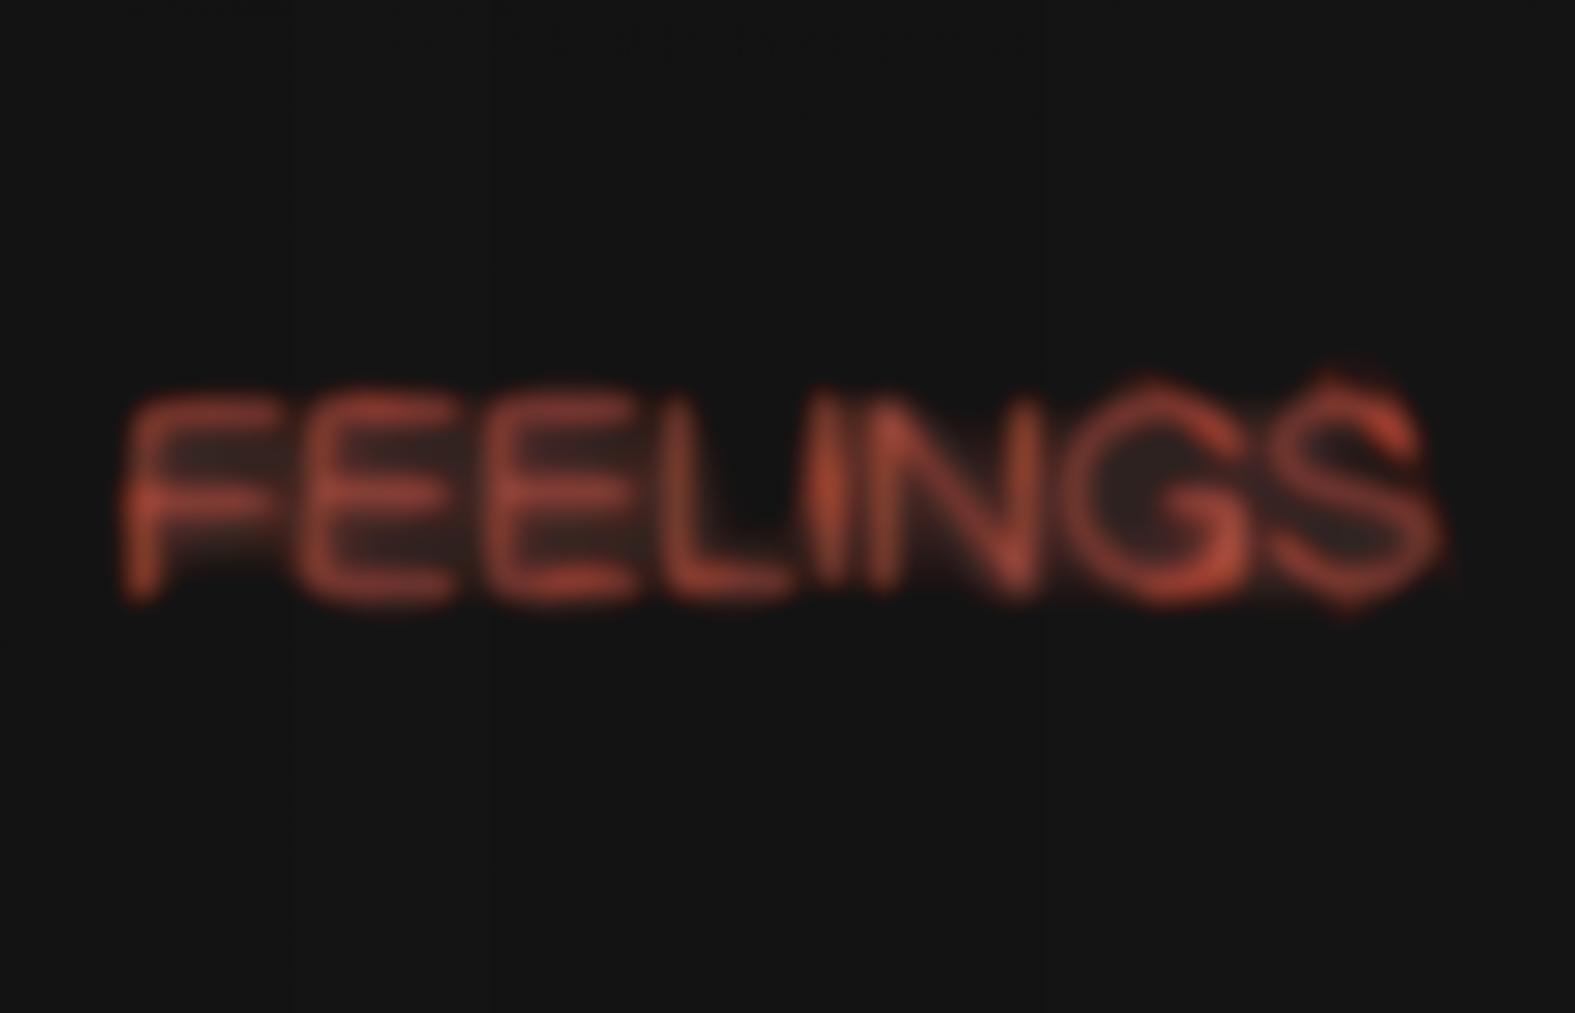 Martin Creed-Work No. 471 (Feelings)-2005